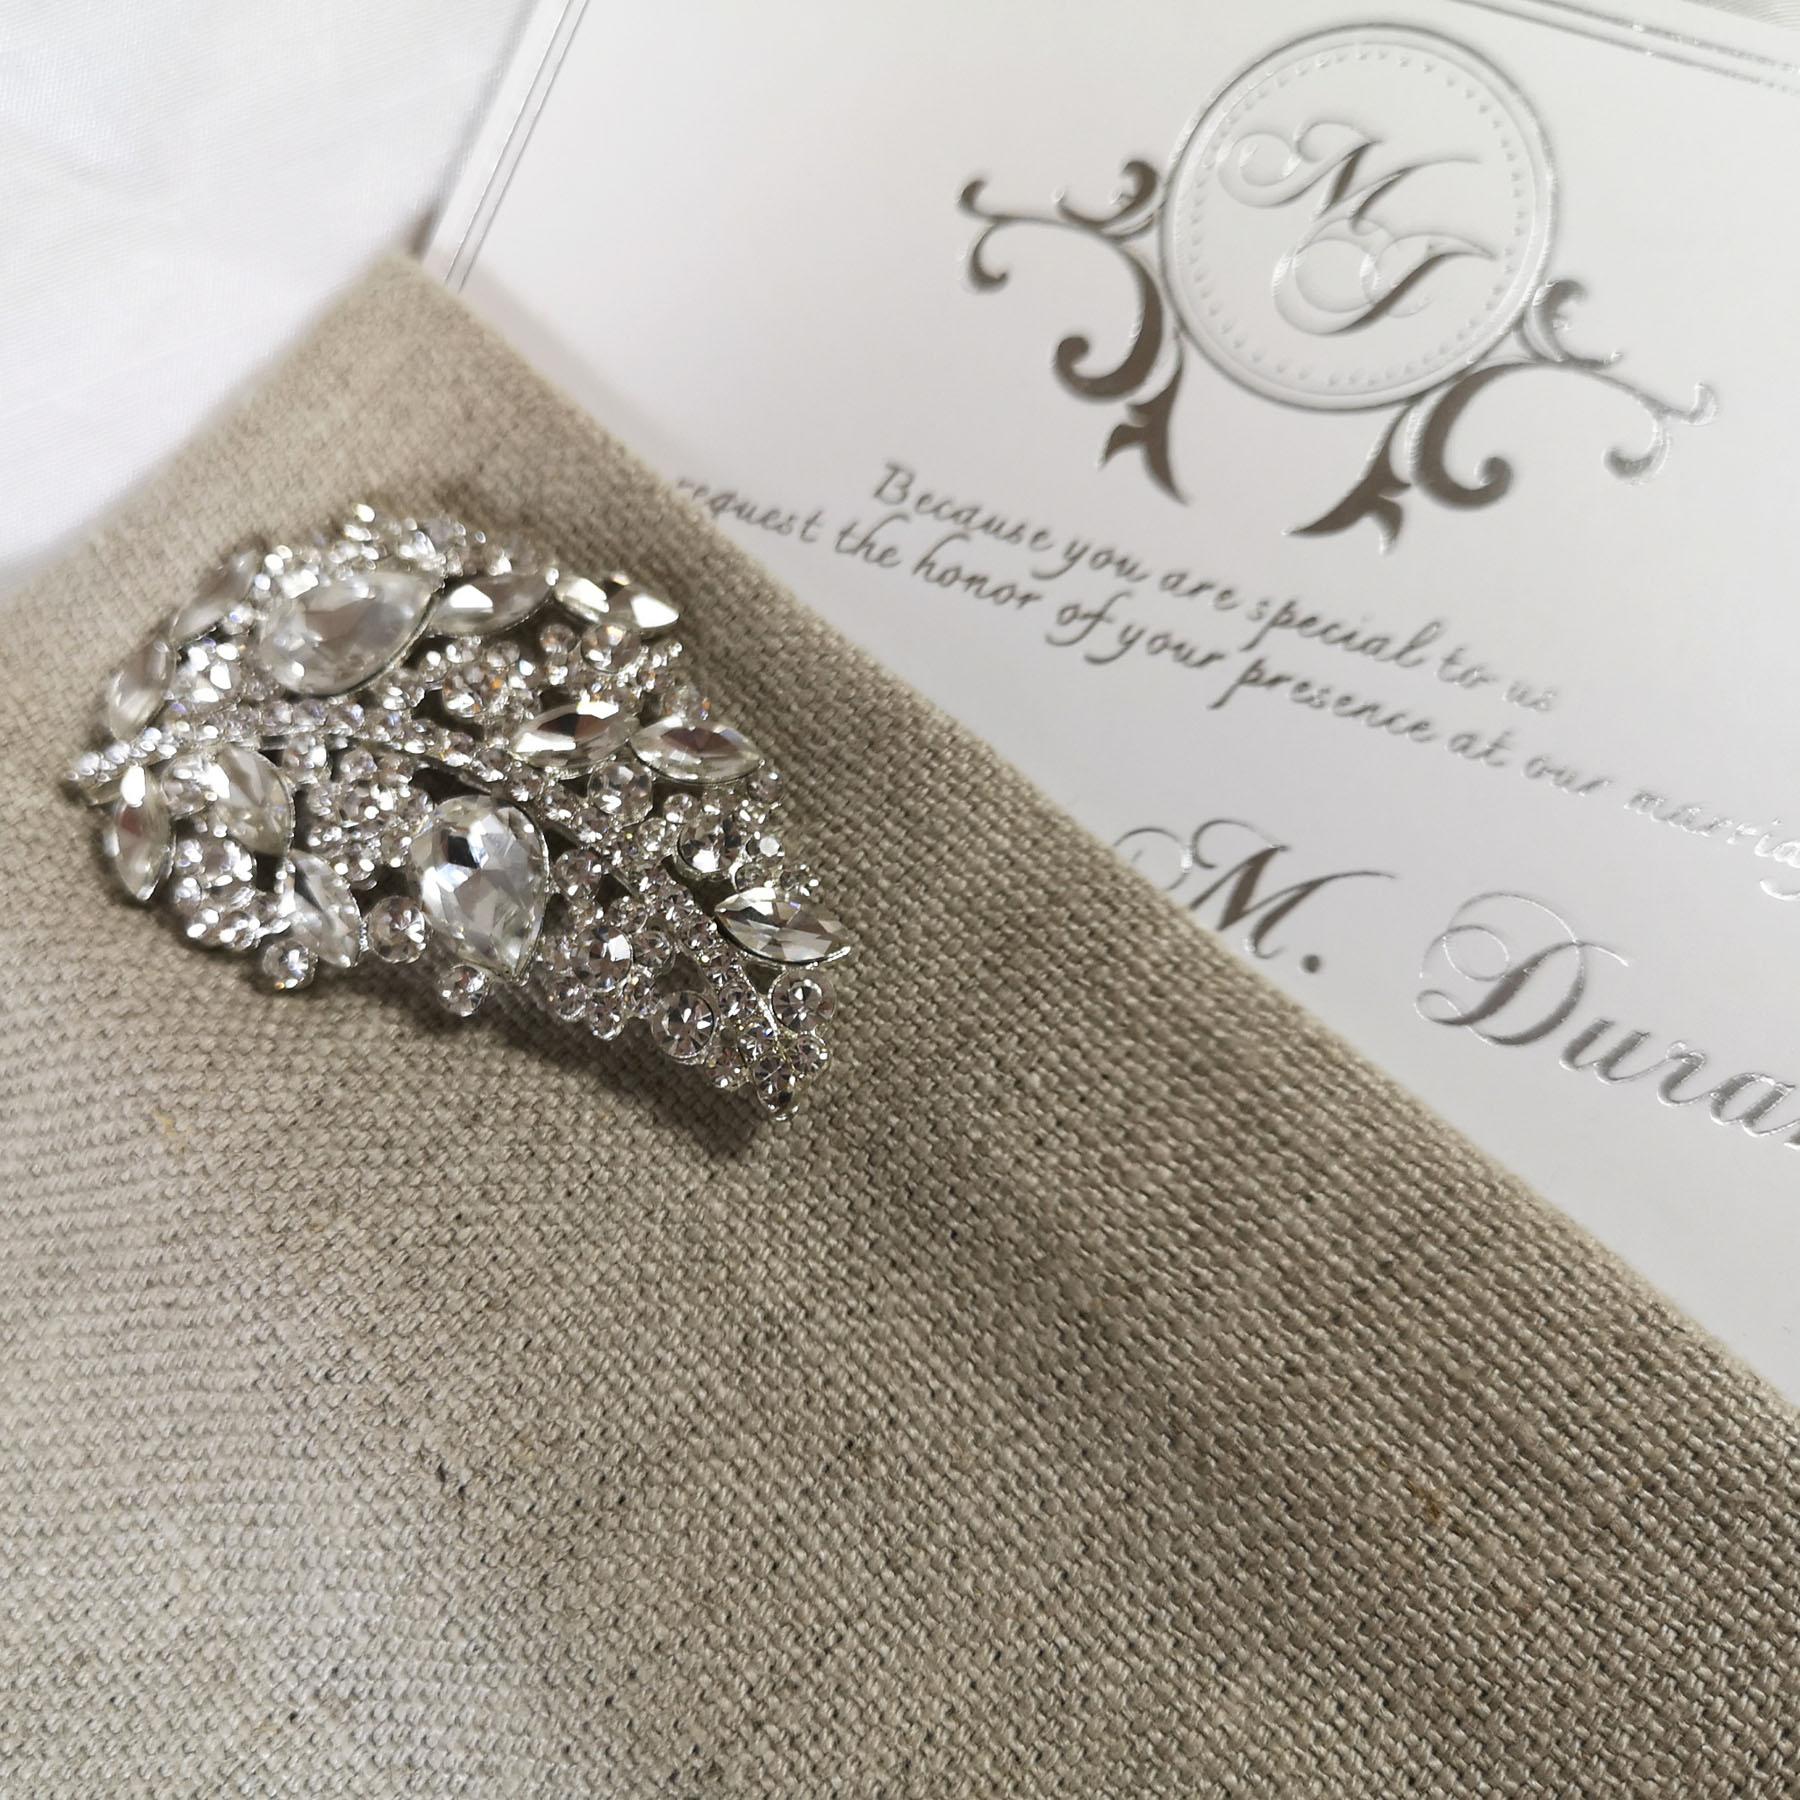 Luxury linen invitations